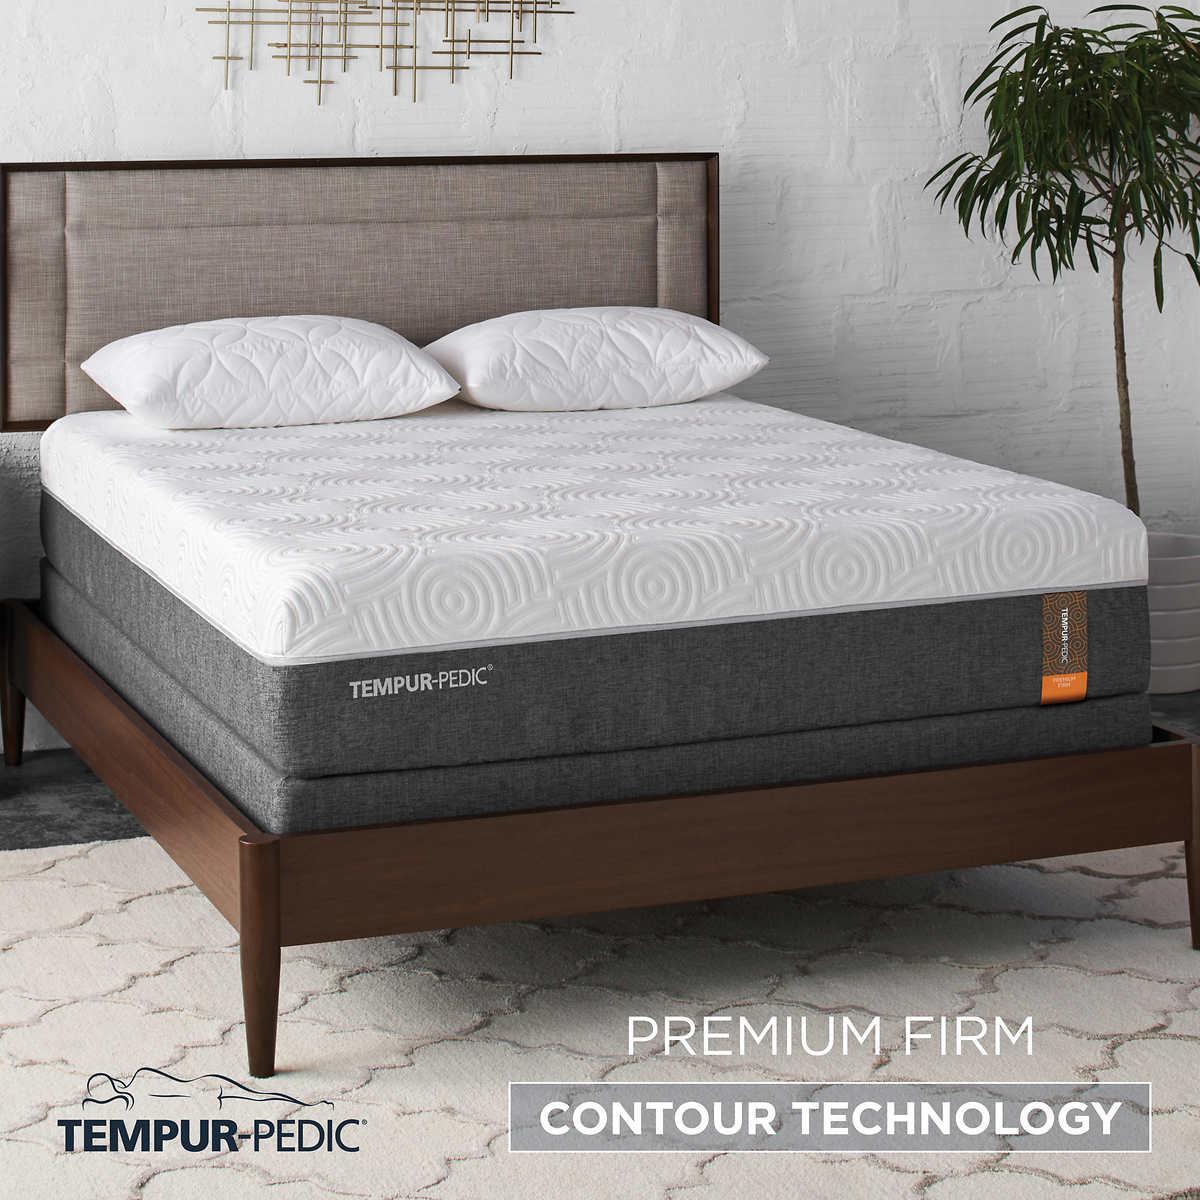 tempur-pedic mattresses   costco